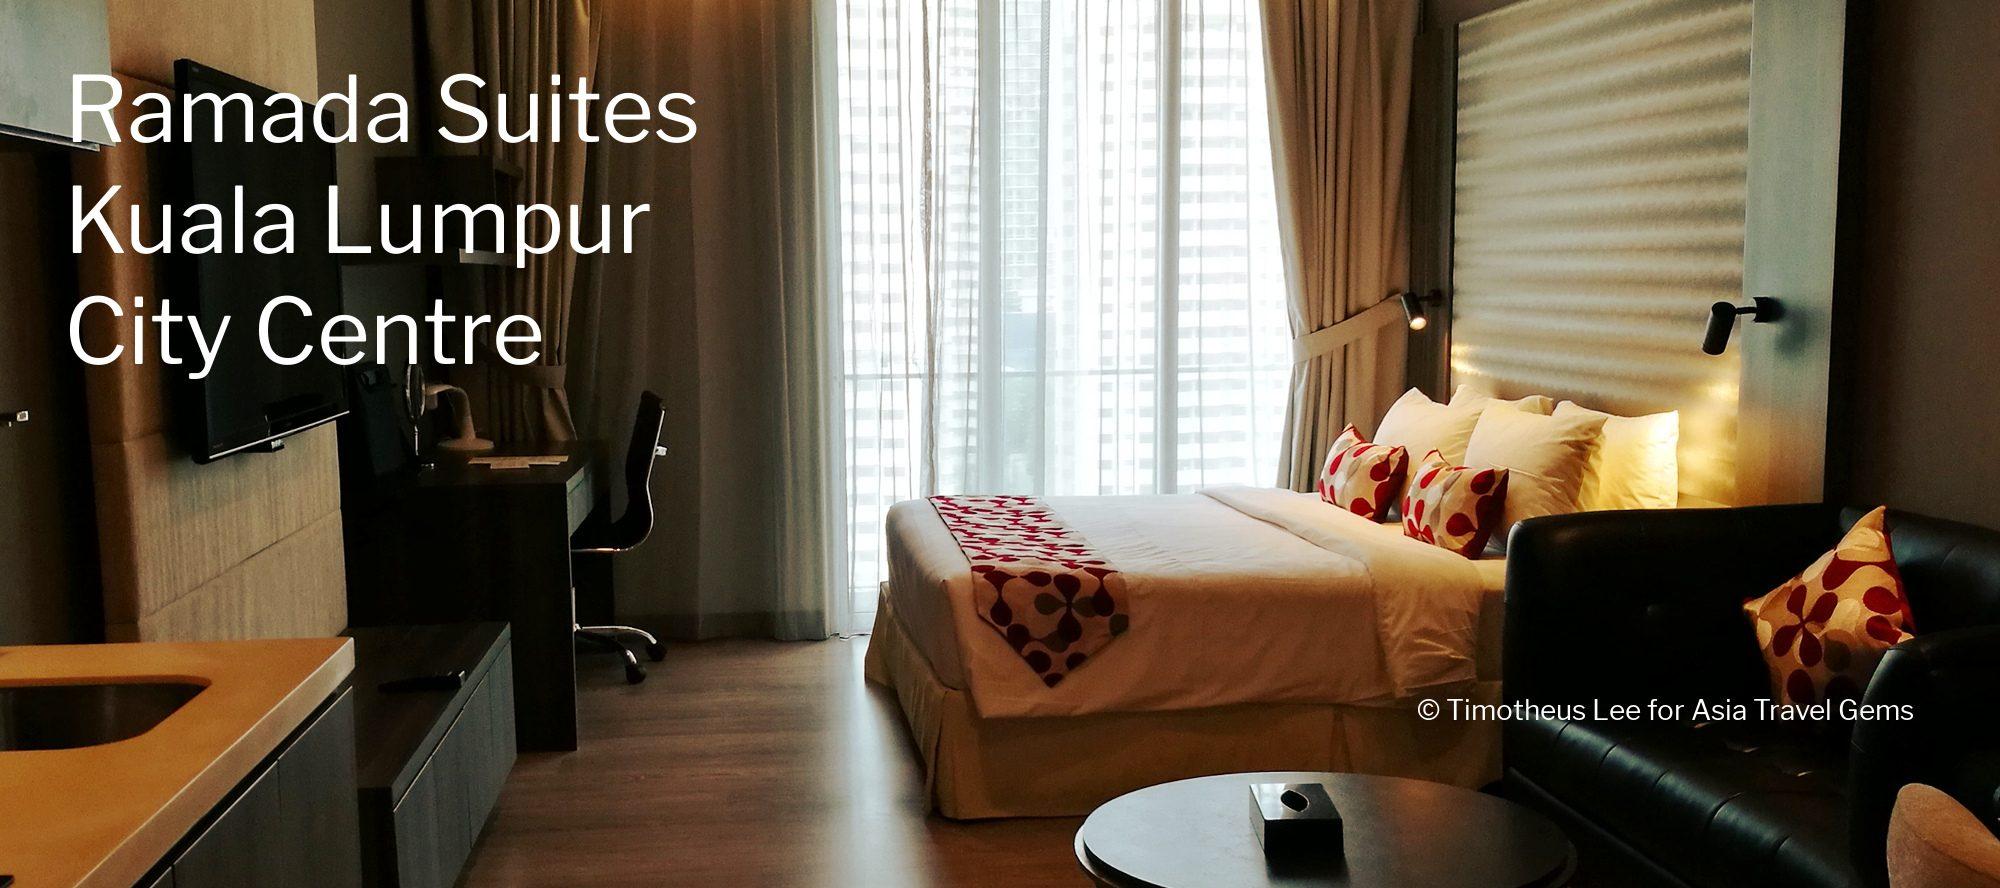 Kuala Lumpur Hotels - Ramada Suites Kuala Lumpur City Centre